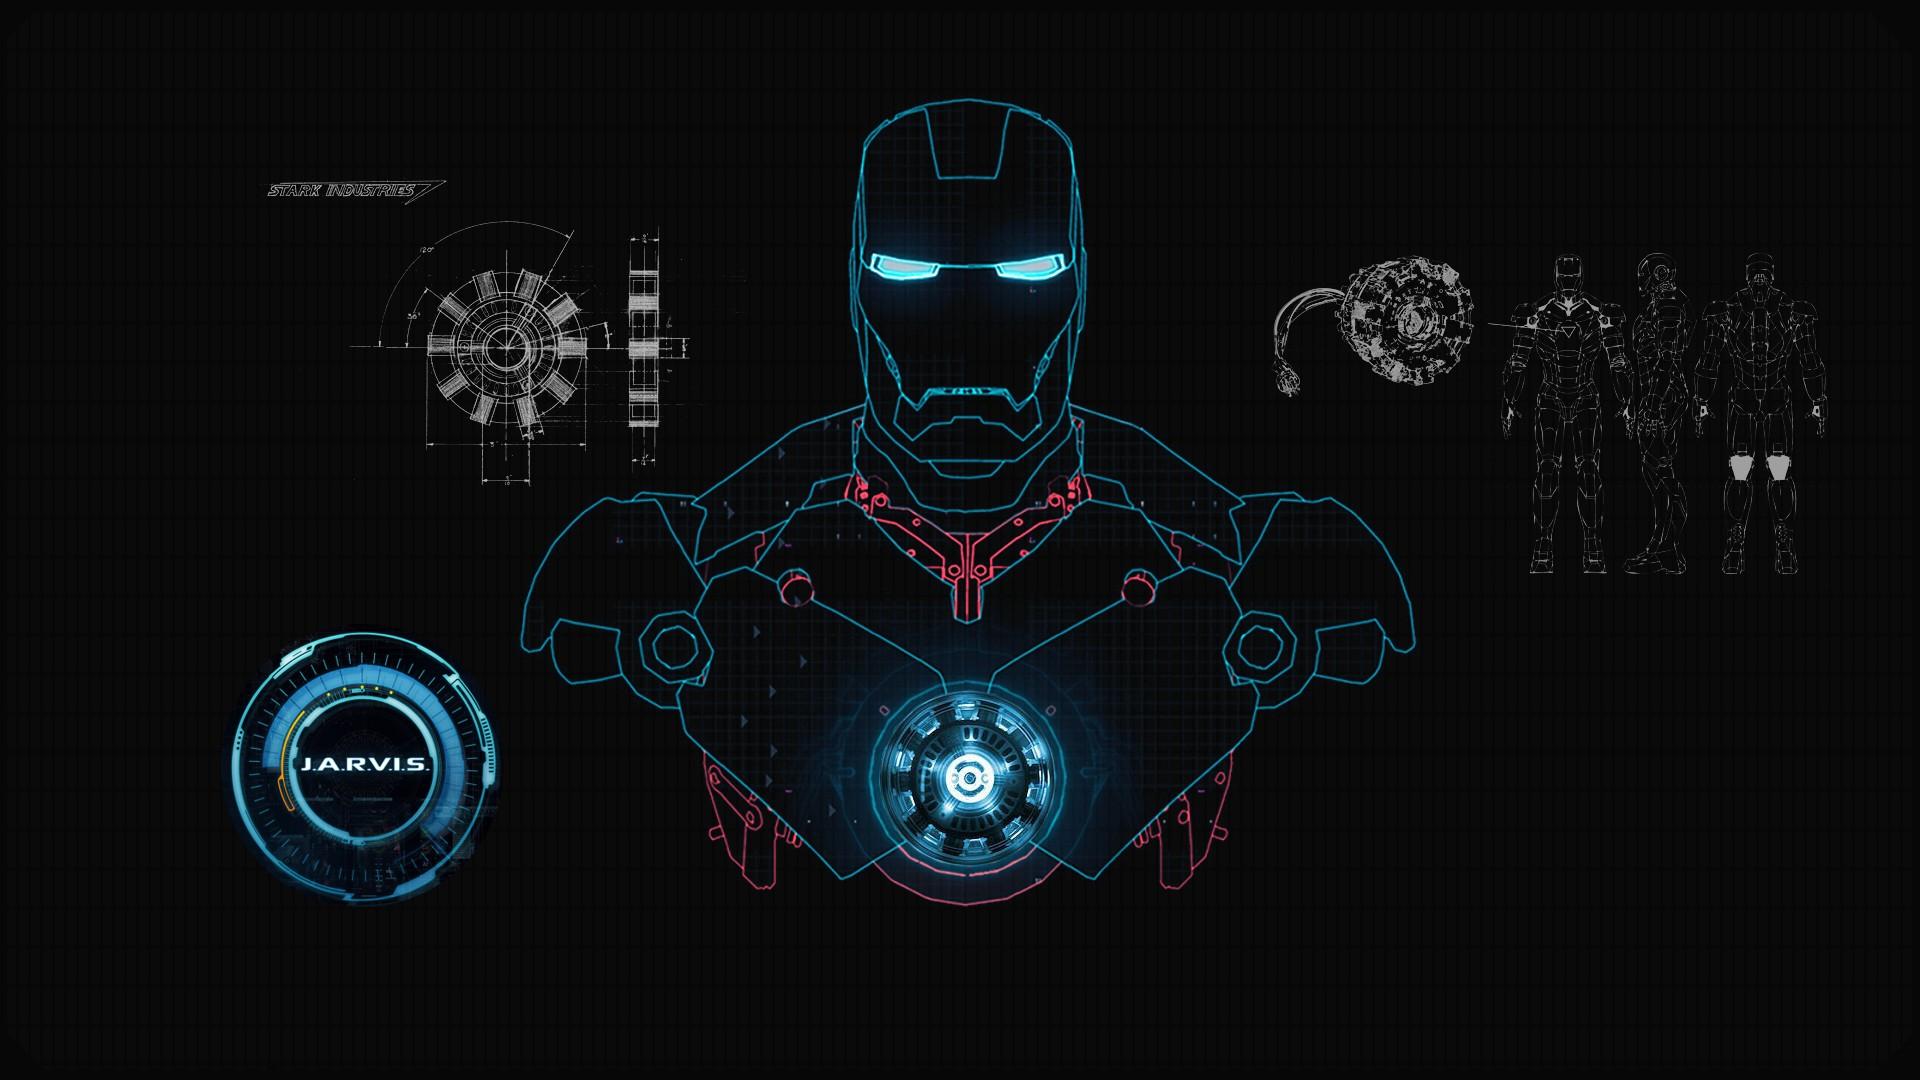 Tony Stark Car Wallpaper